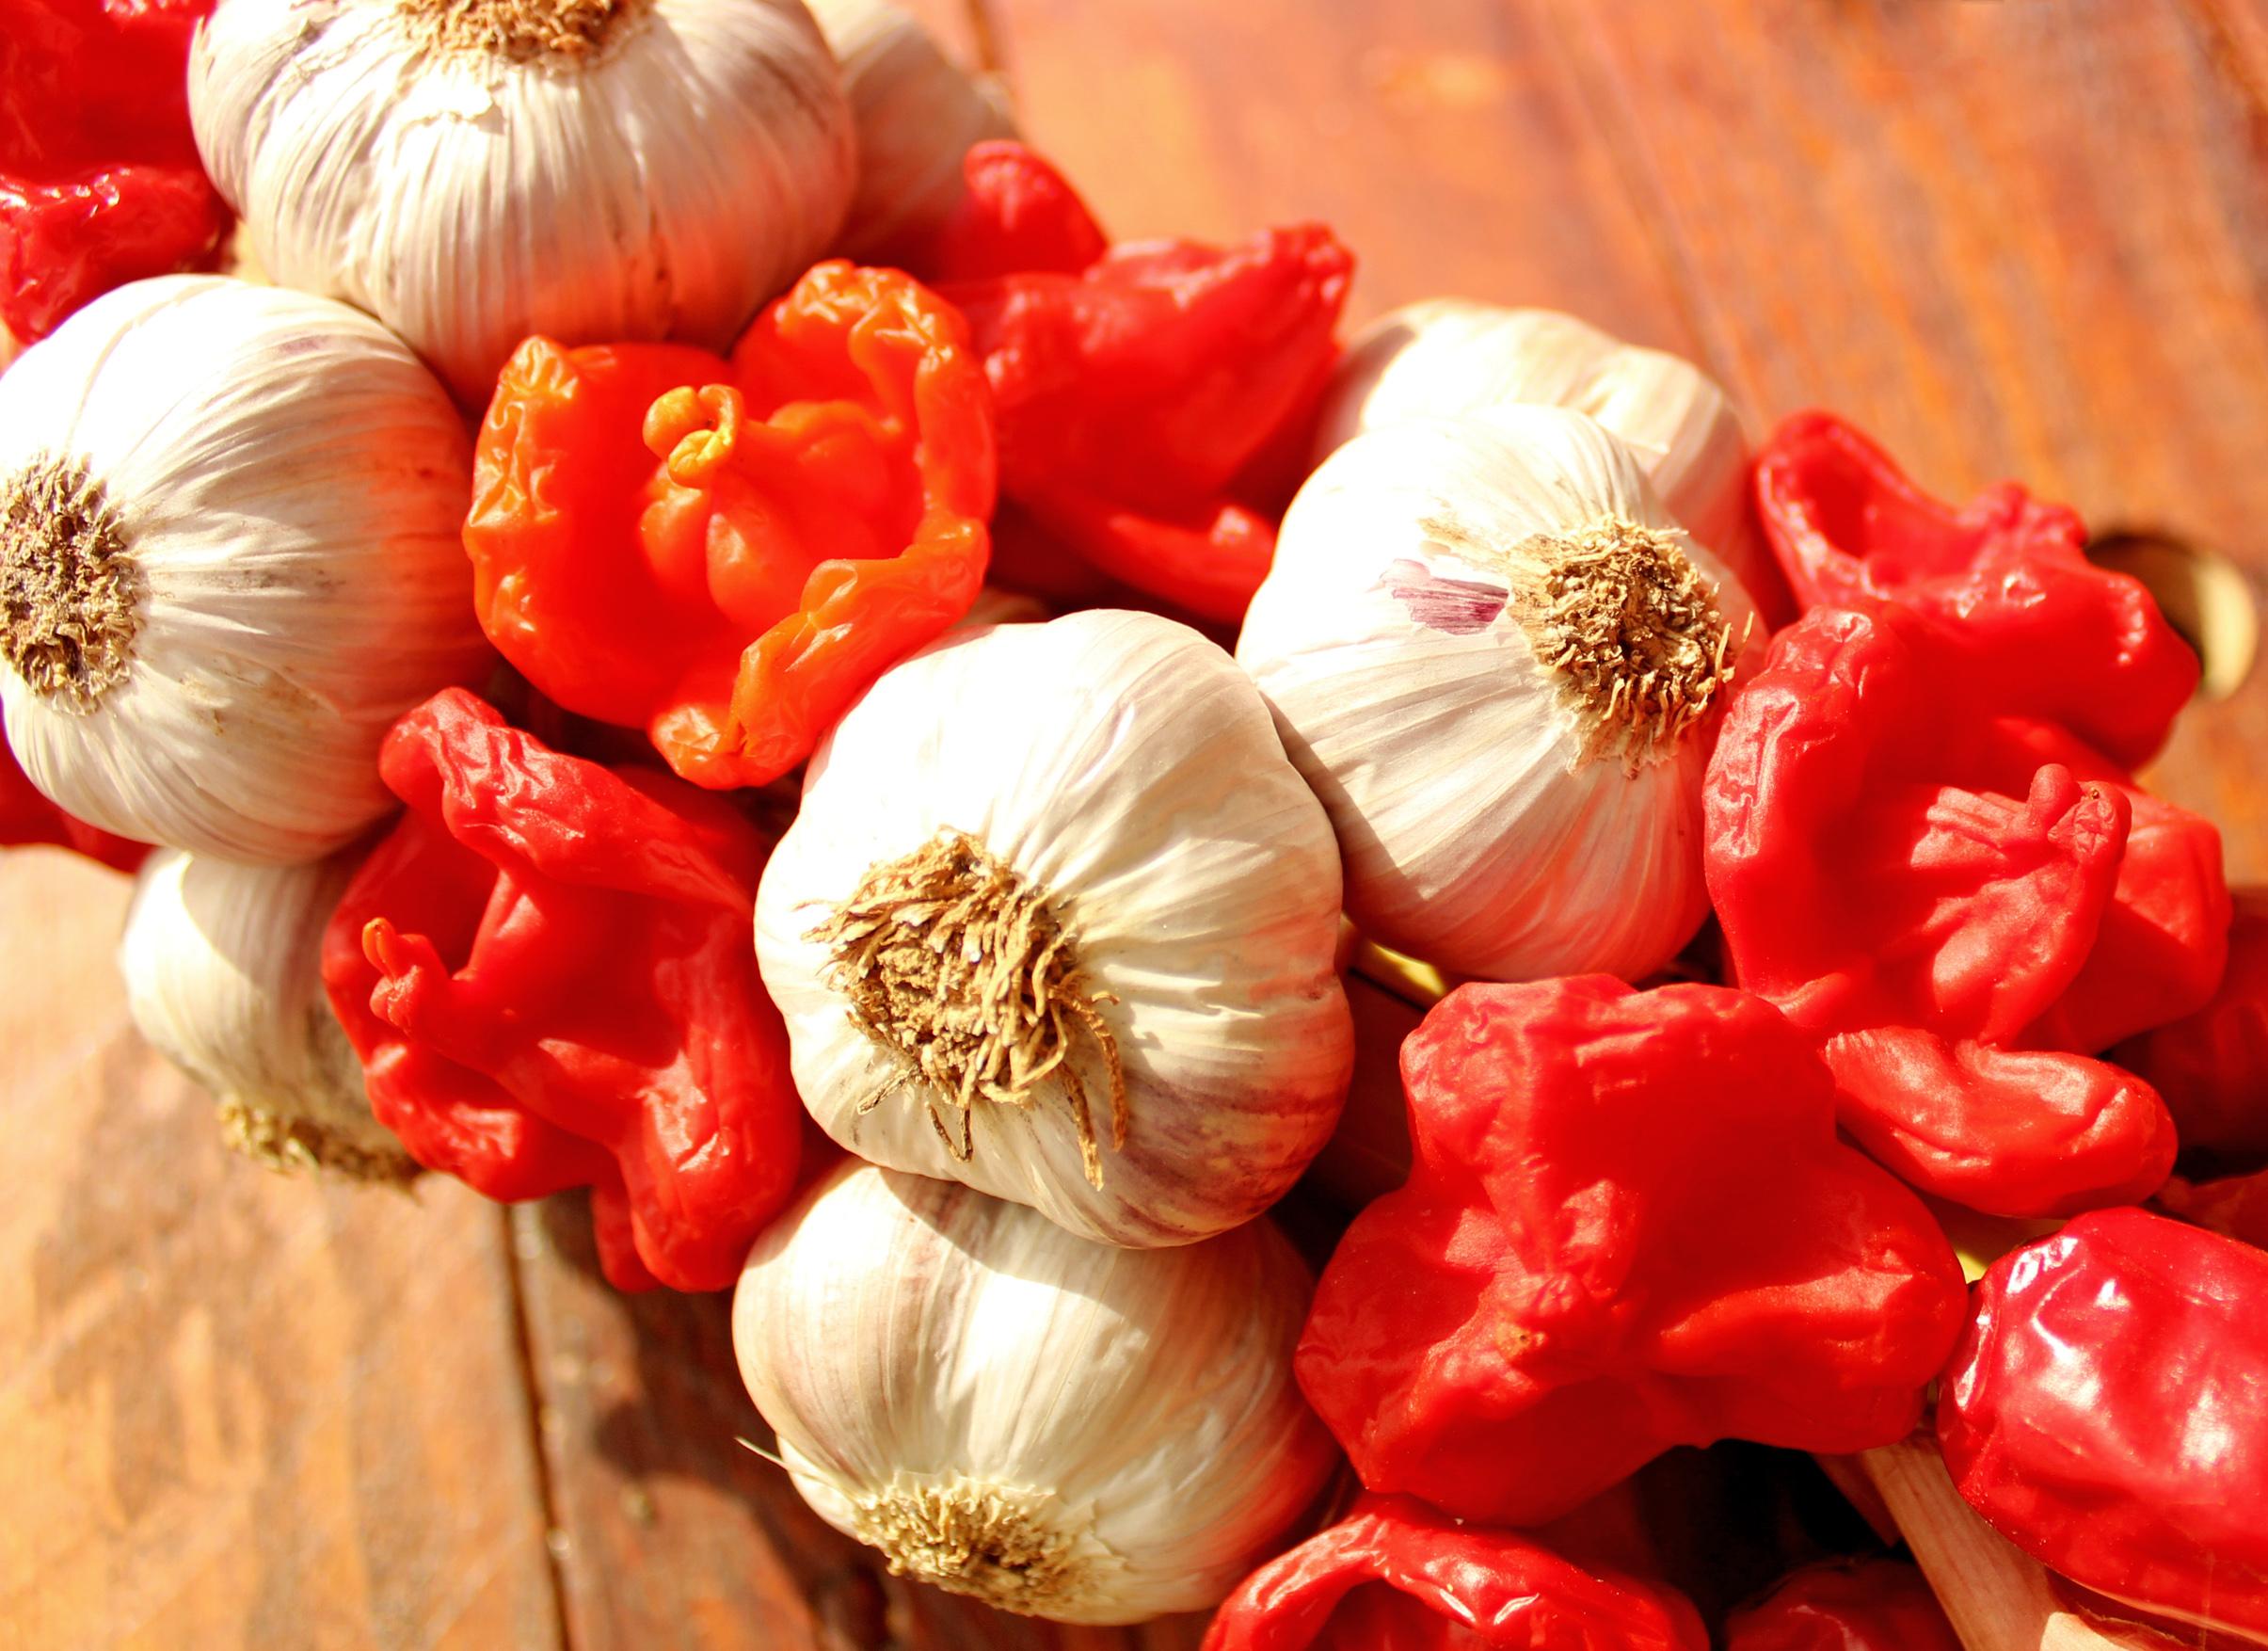 Garlic and Pepper - Mediterranean Cuisine, Allium, Pineapple, Natural, Nutrient, HQ Photo